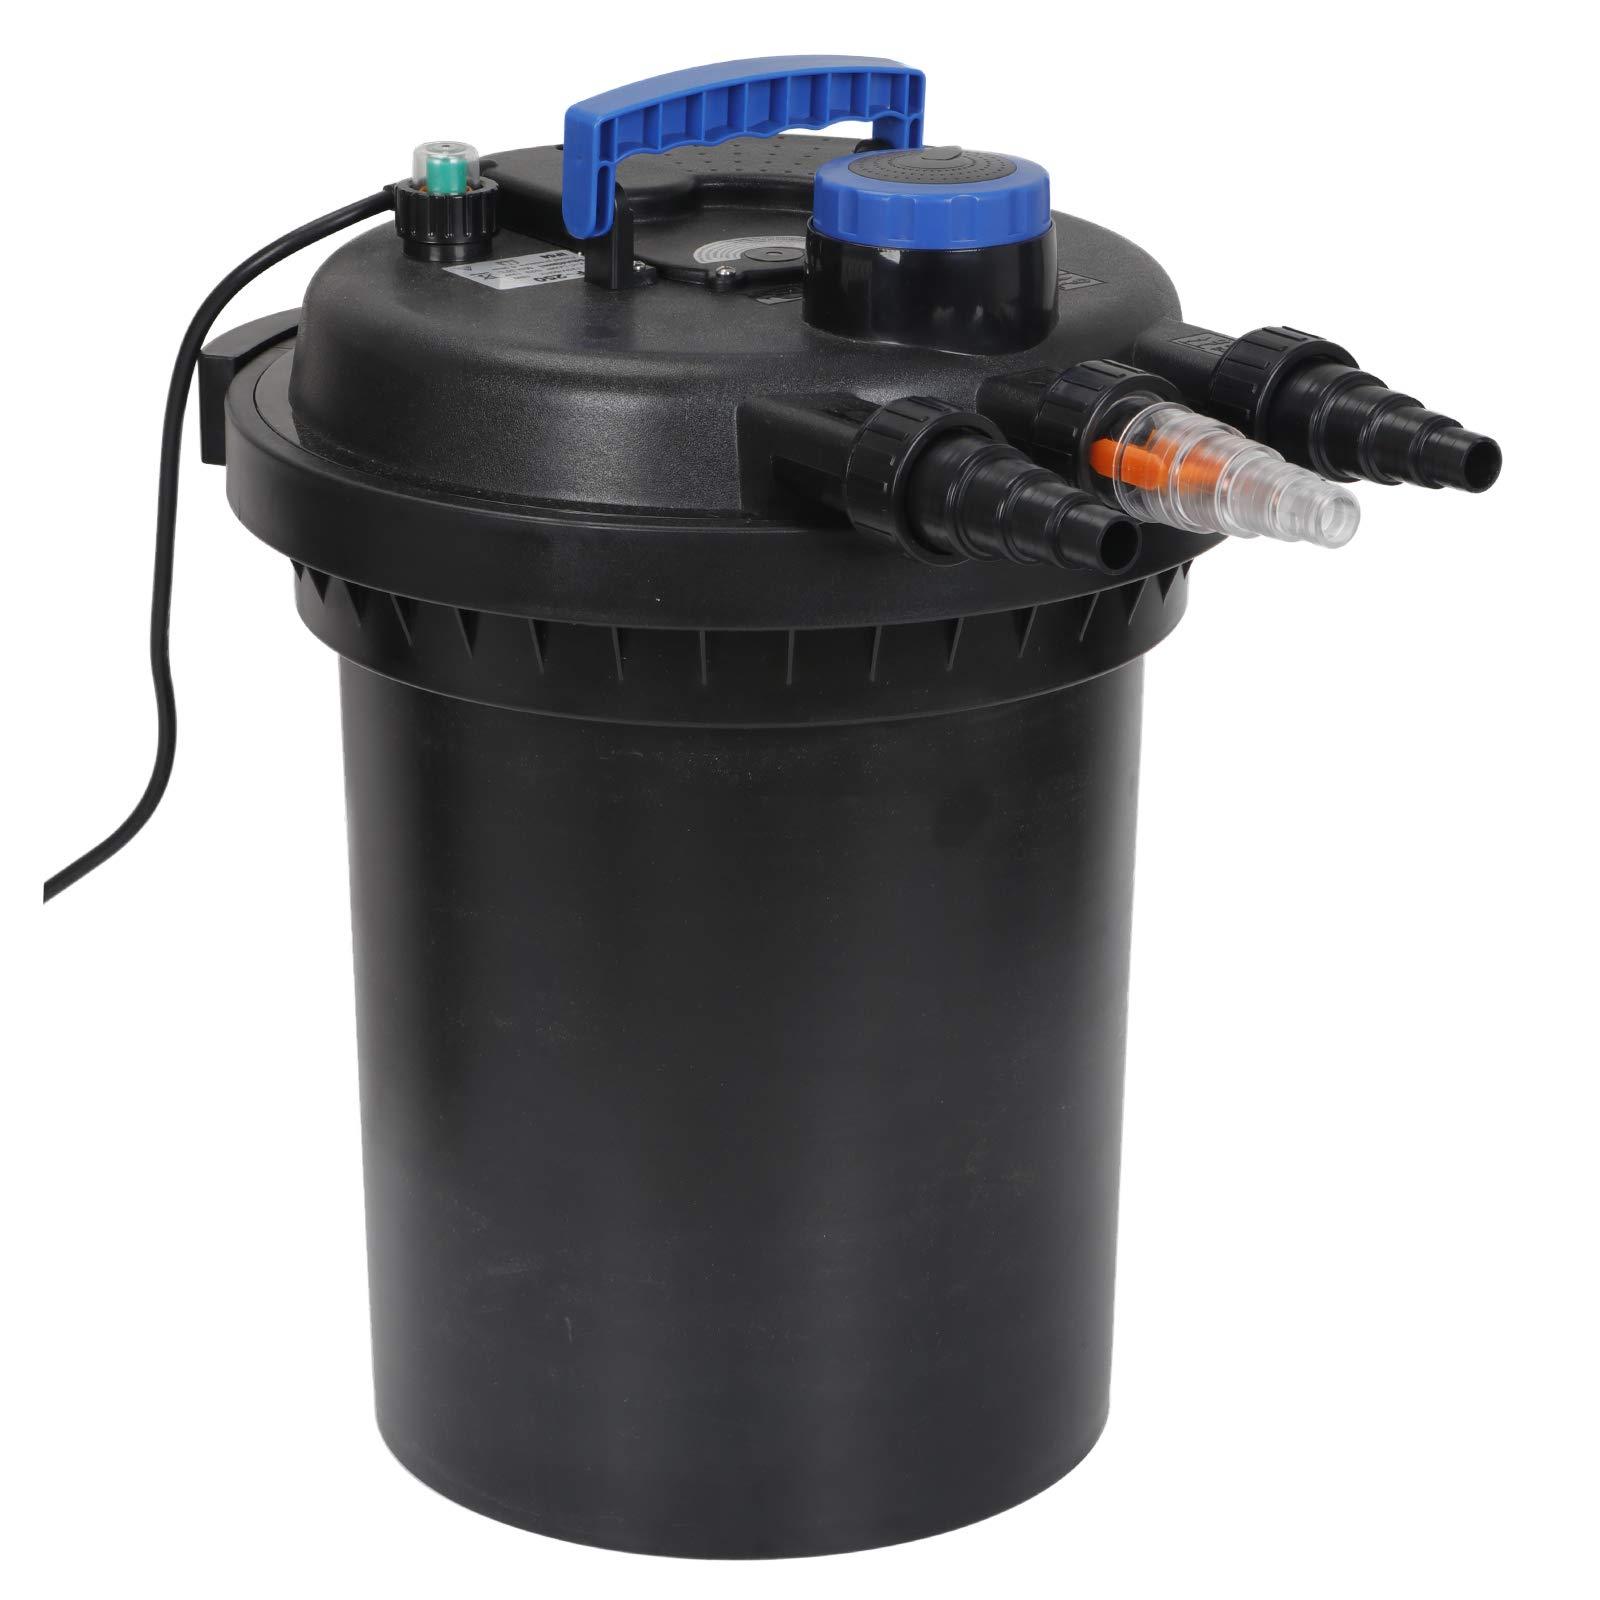 10000L Pond Pressure Bio Filter UV Sterilizer Water PurifierClarifier Koi Fish Ponds Skimmer With Ultraviolet Light& Flow Indicator for Aquarium,Algae Control by ZENSTYLE (Image #1)